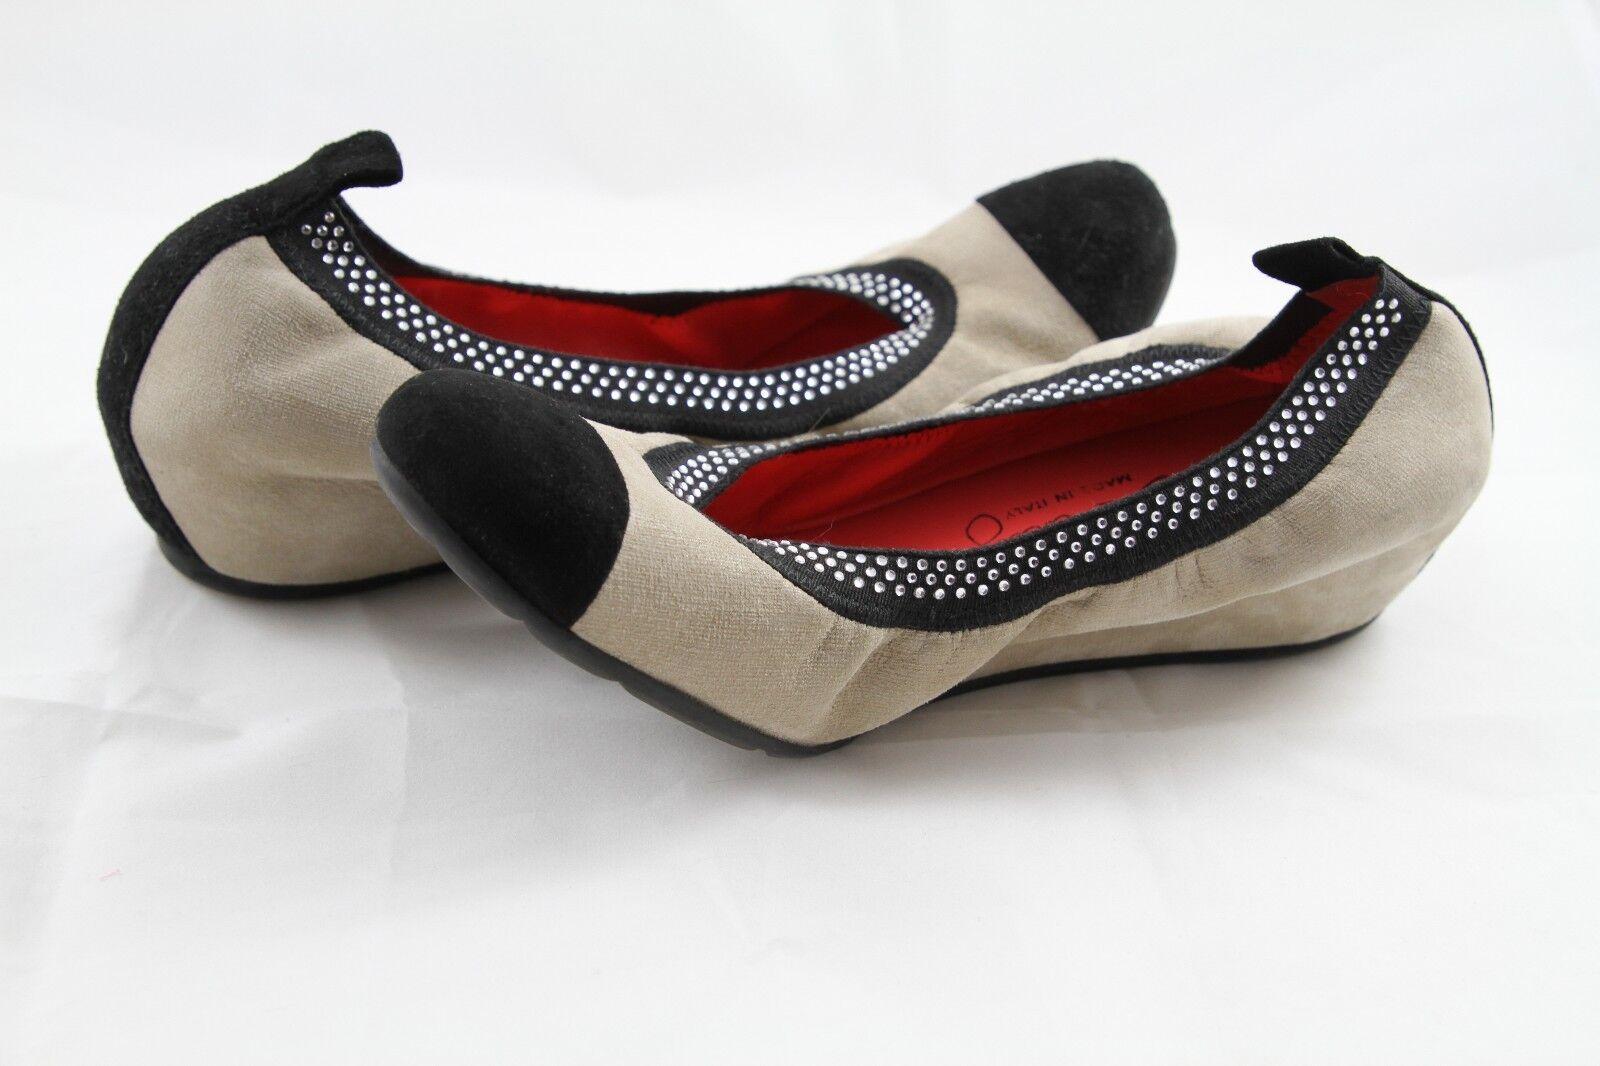 Pas De red 'Petra' Wedge Wedge Wedge shoes Elastic Beige Black Ballet 37.5 1 2 7 4.5 26f0f1